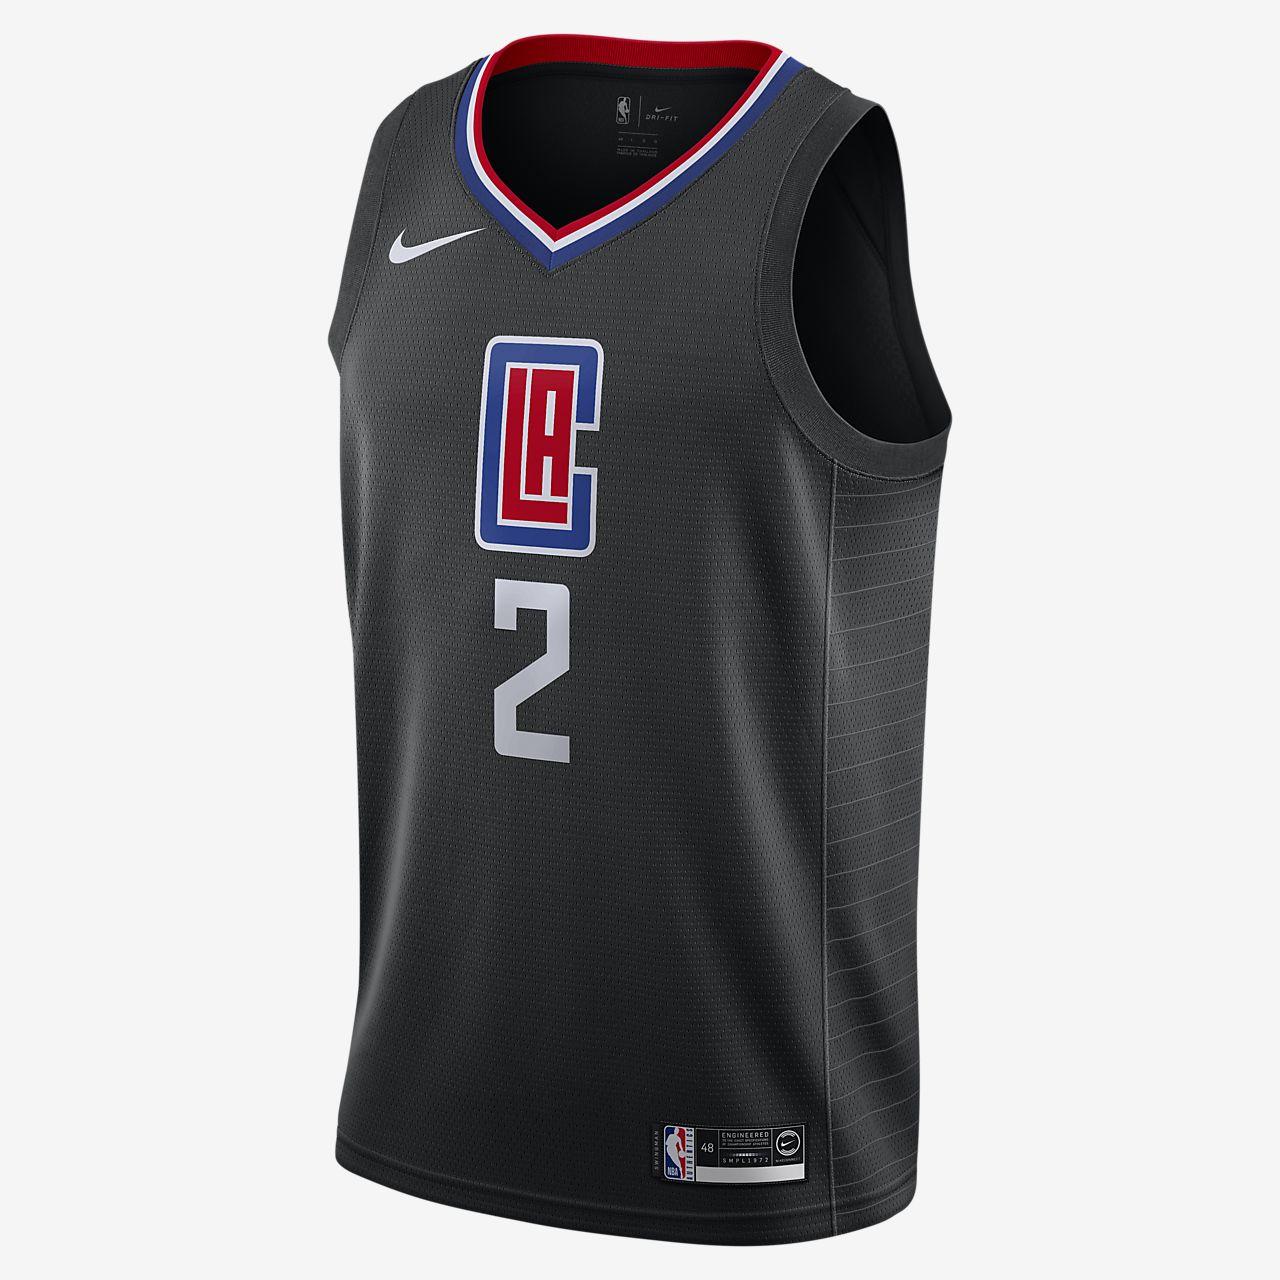 Kawhi Leonard Clippers Statement Edition Nike NBA Swingman Jersey